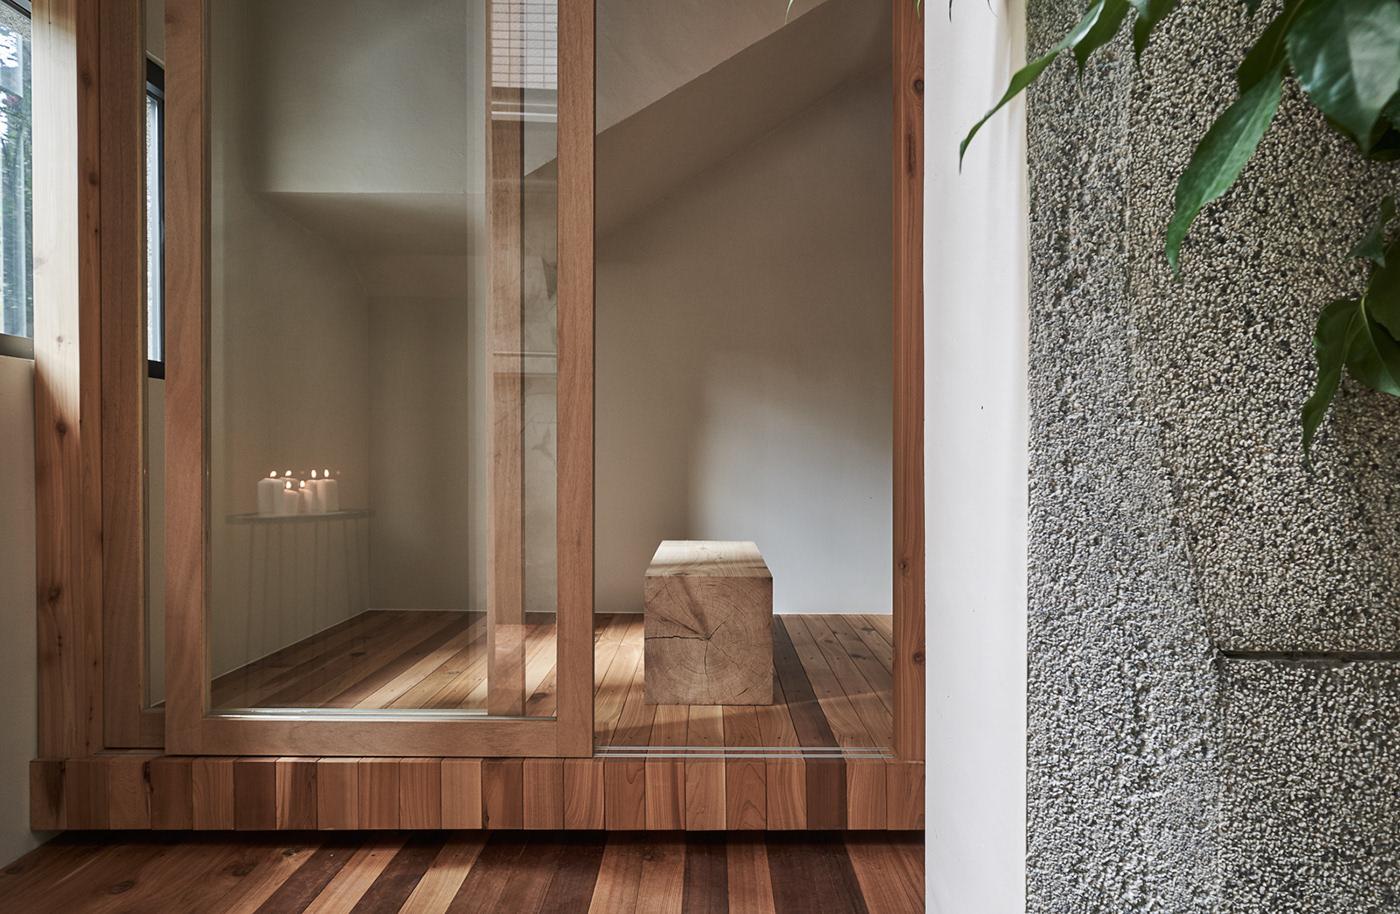 architecture Commercial Store heycheese interior design  renovation Soar Design store design taiwan wood mezzanine